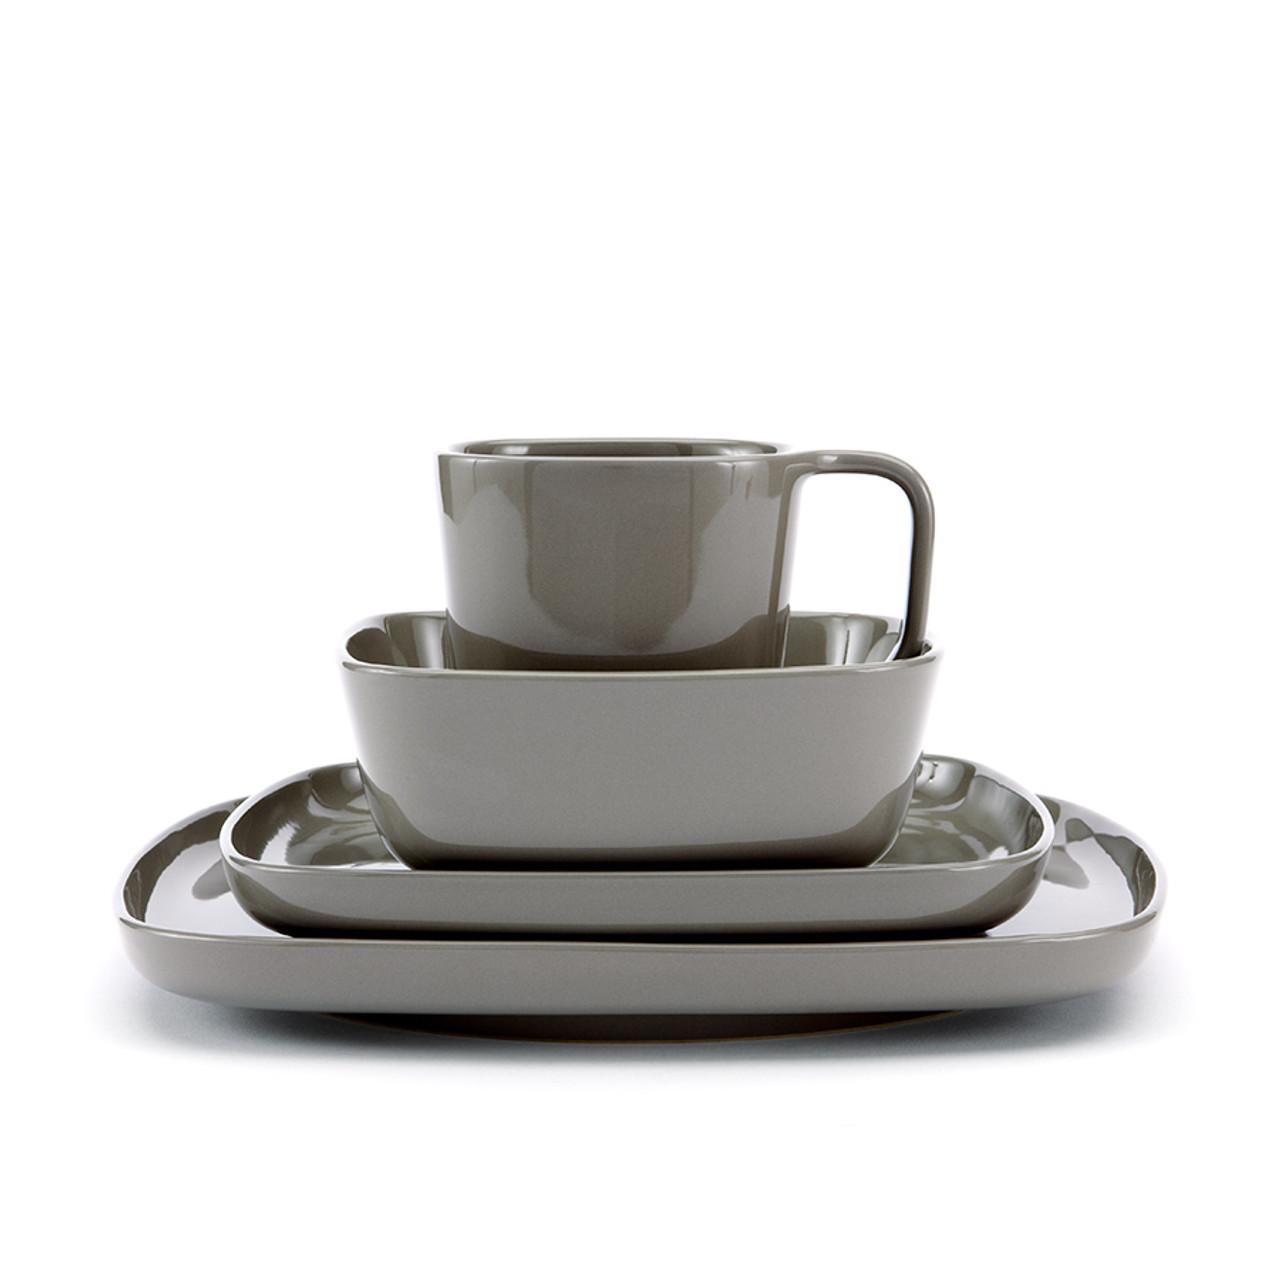 Karo - Taupe-Brown Dinnerware set 16pc